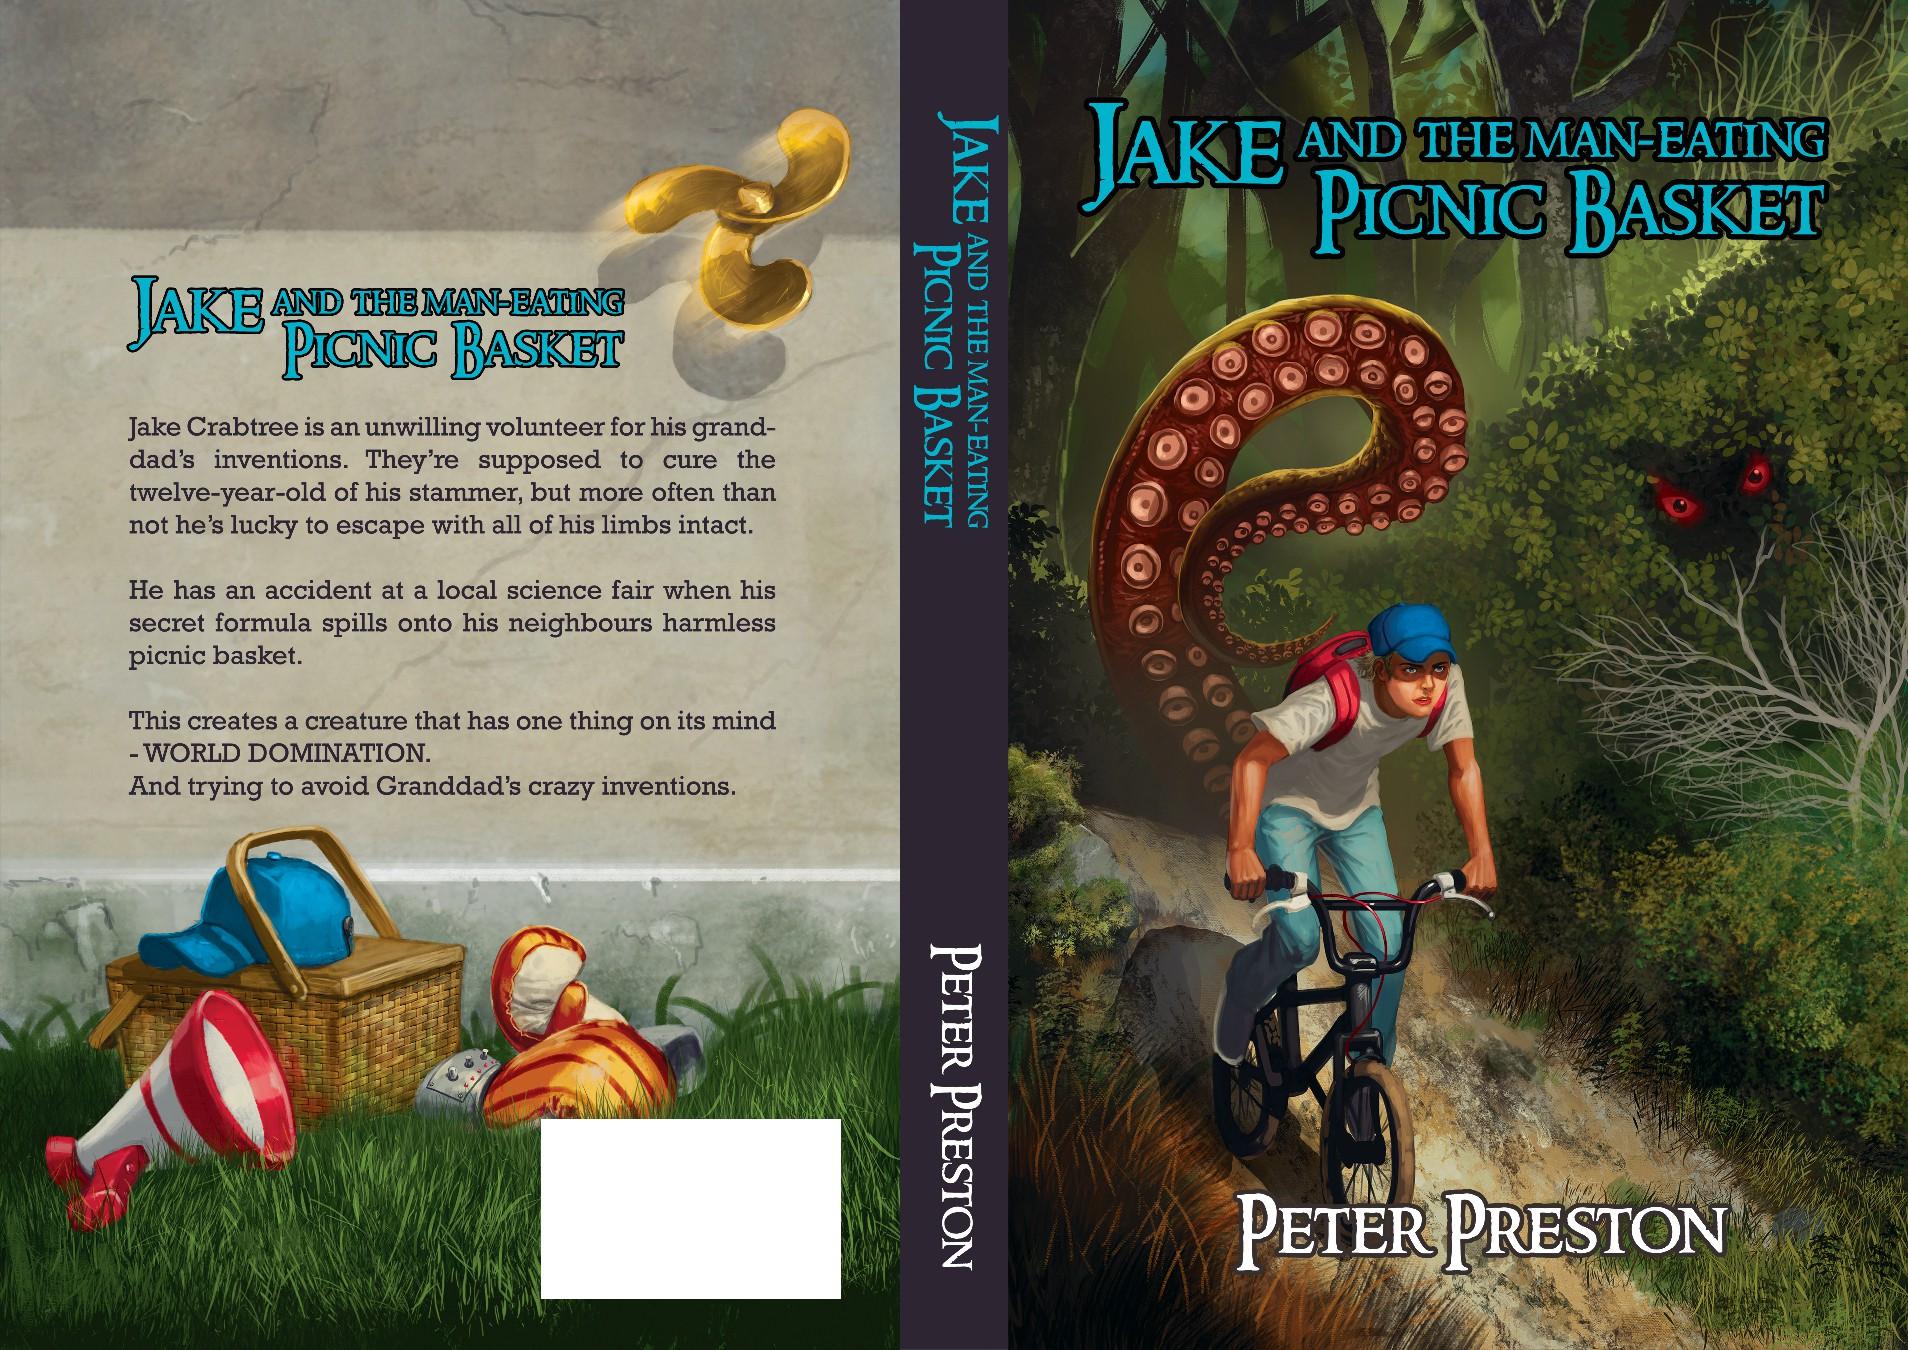 Innovative design for a children's book cover.